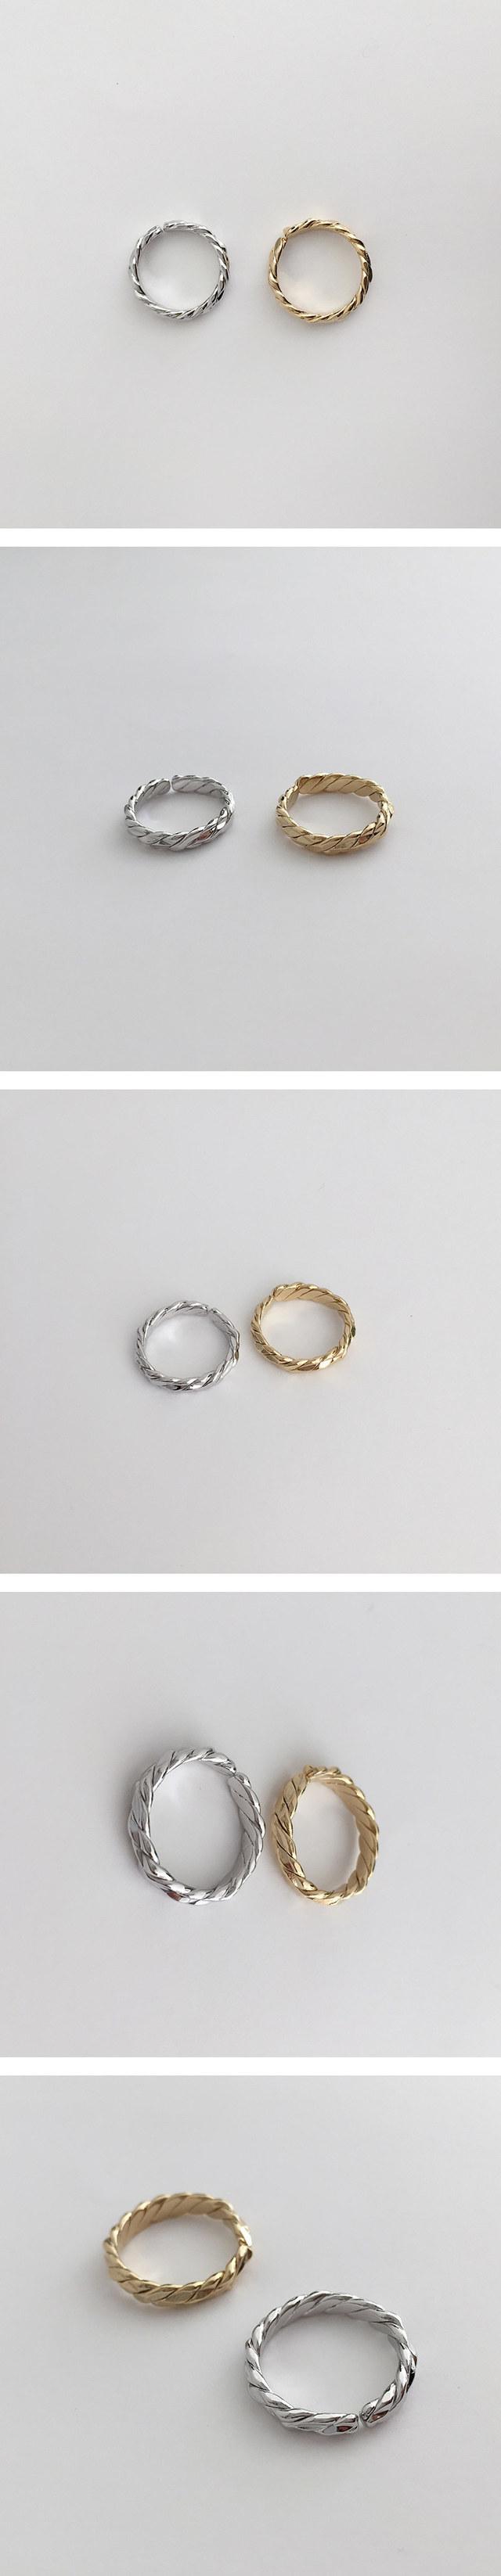 gravity ring